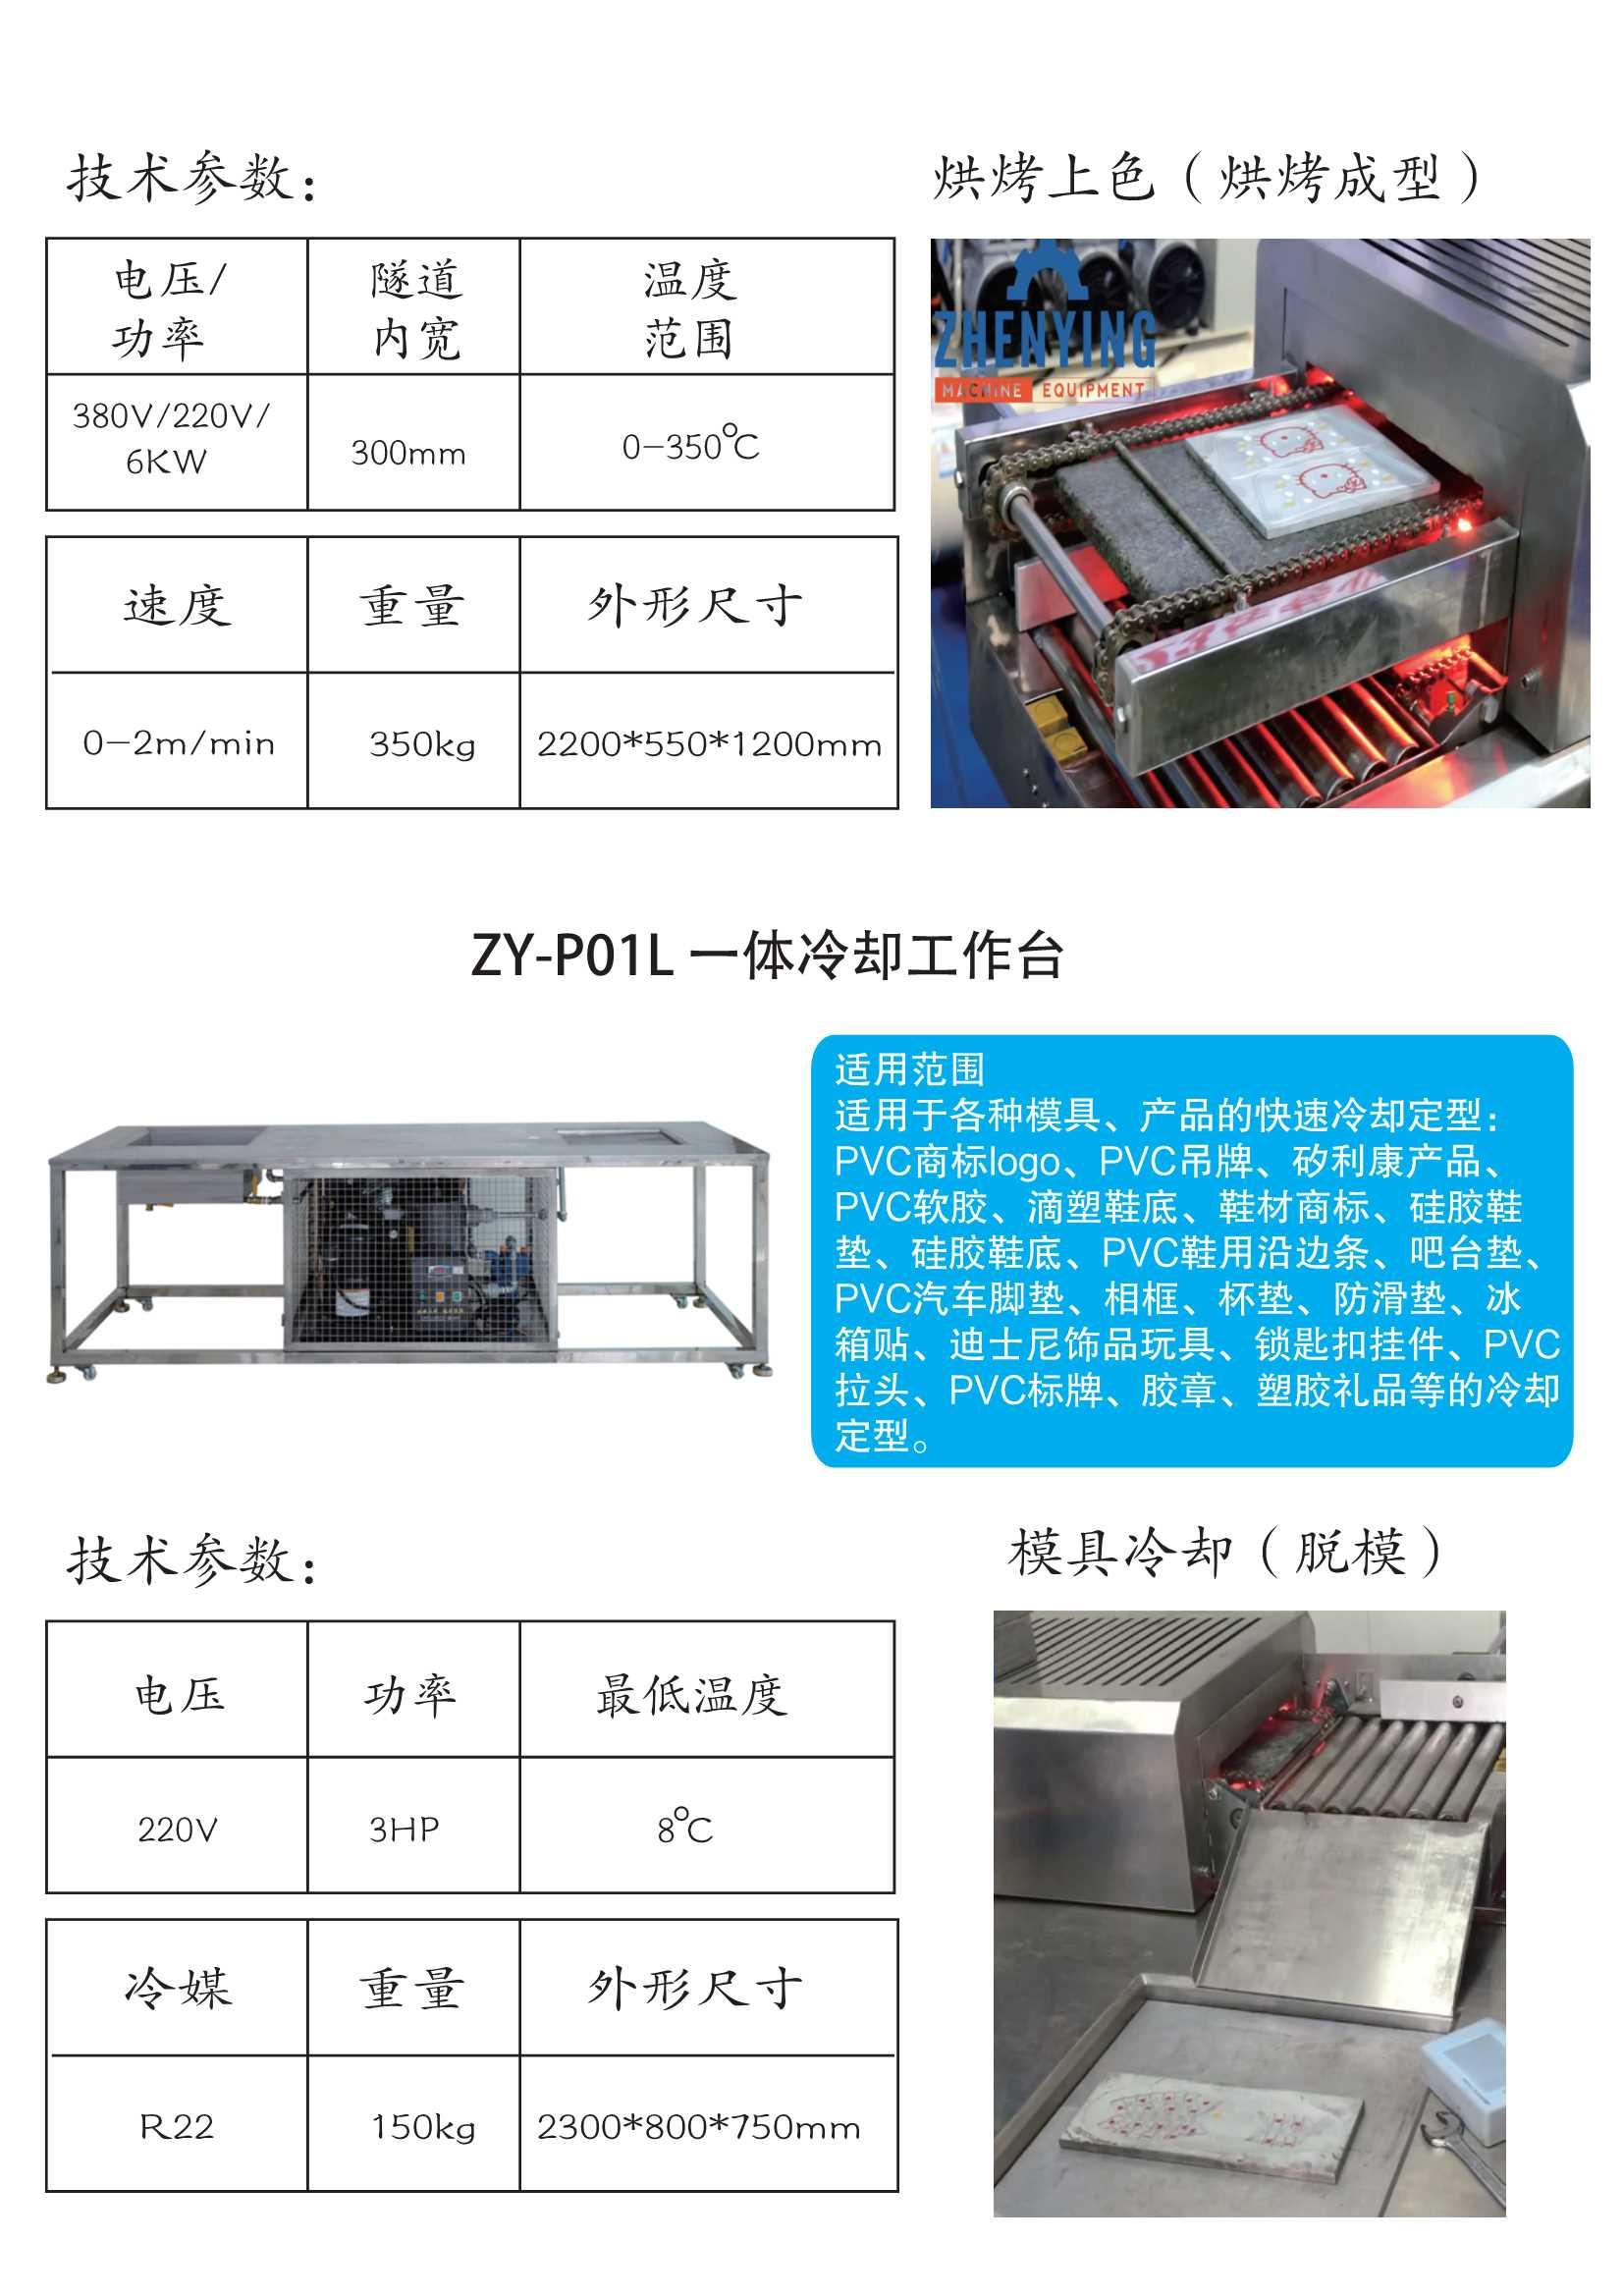 PVC点胶生产线设备